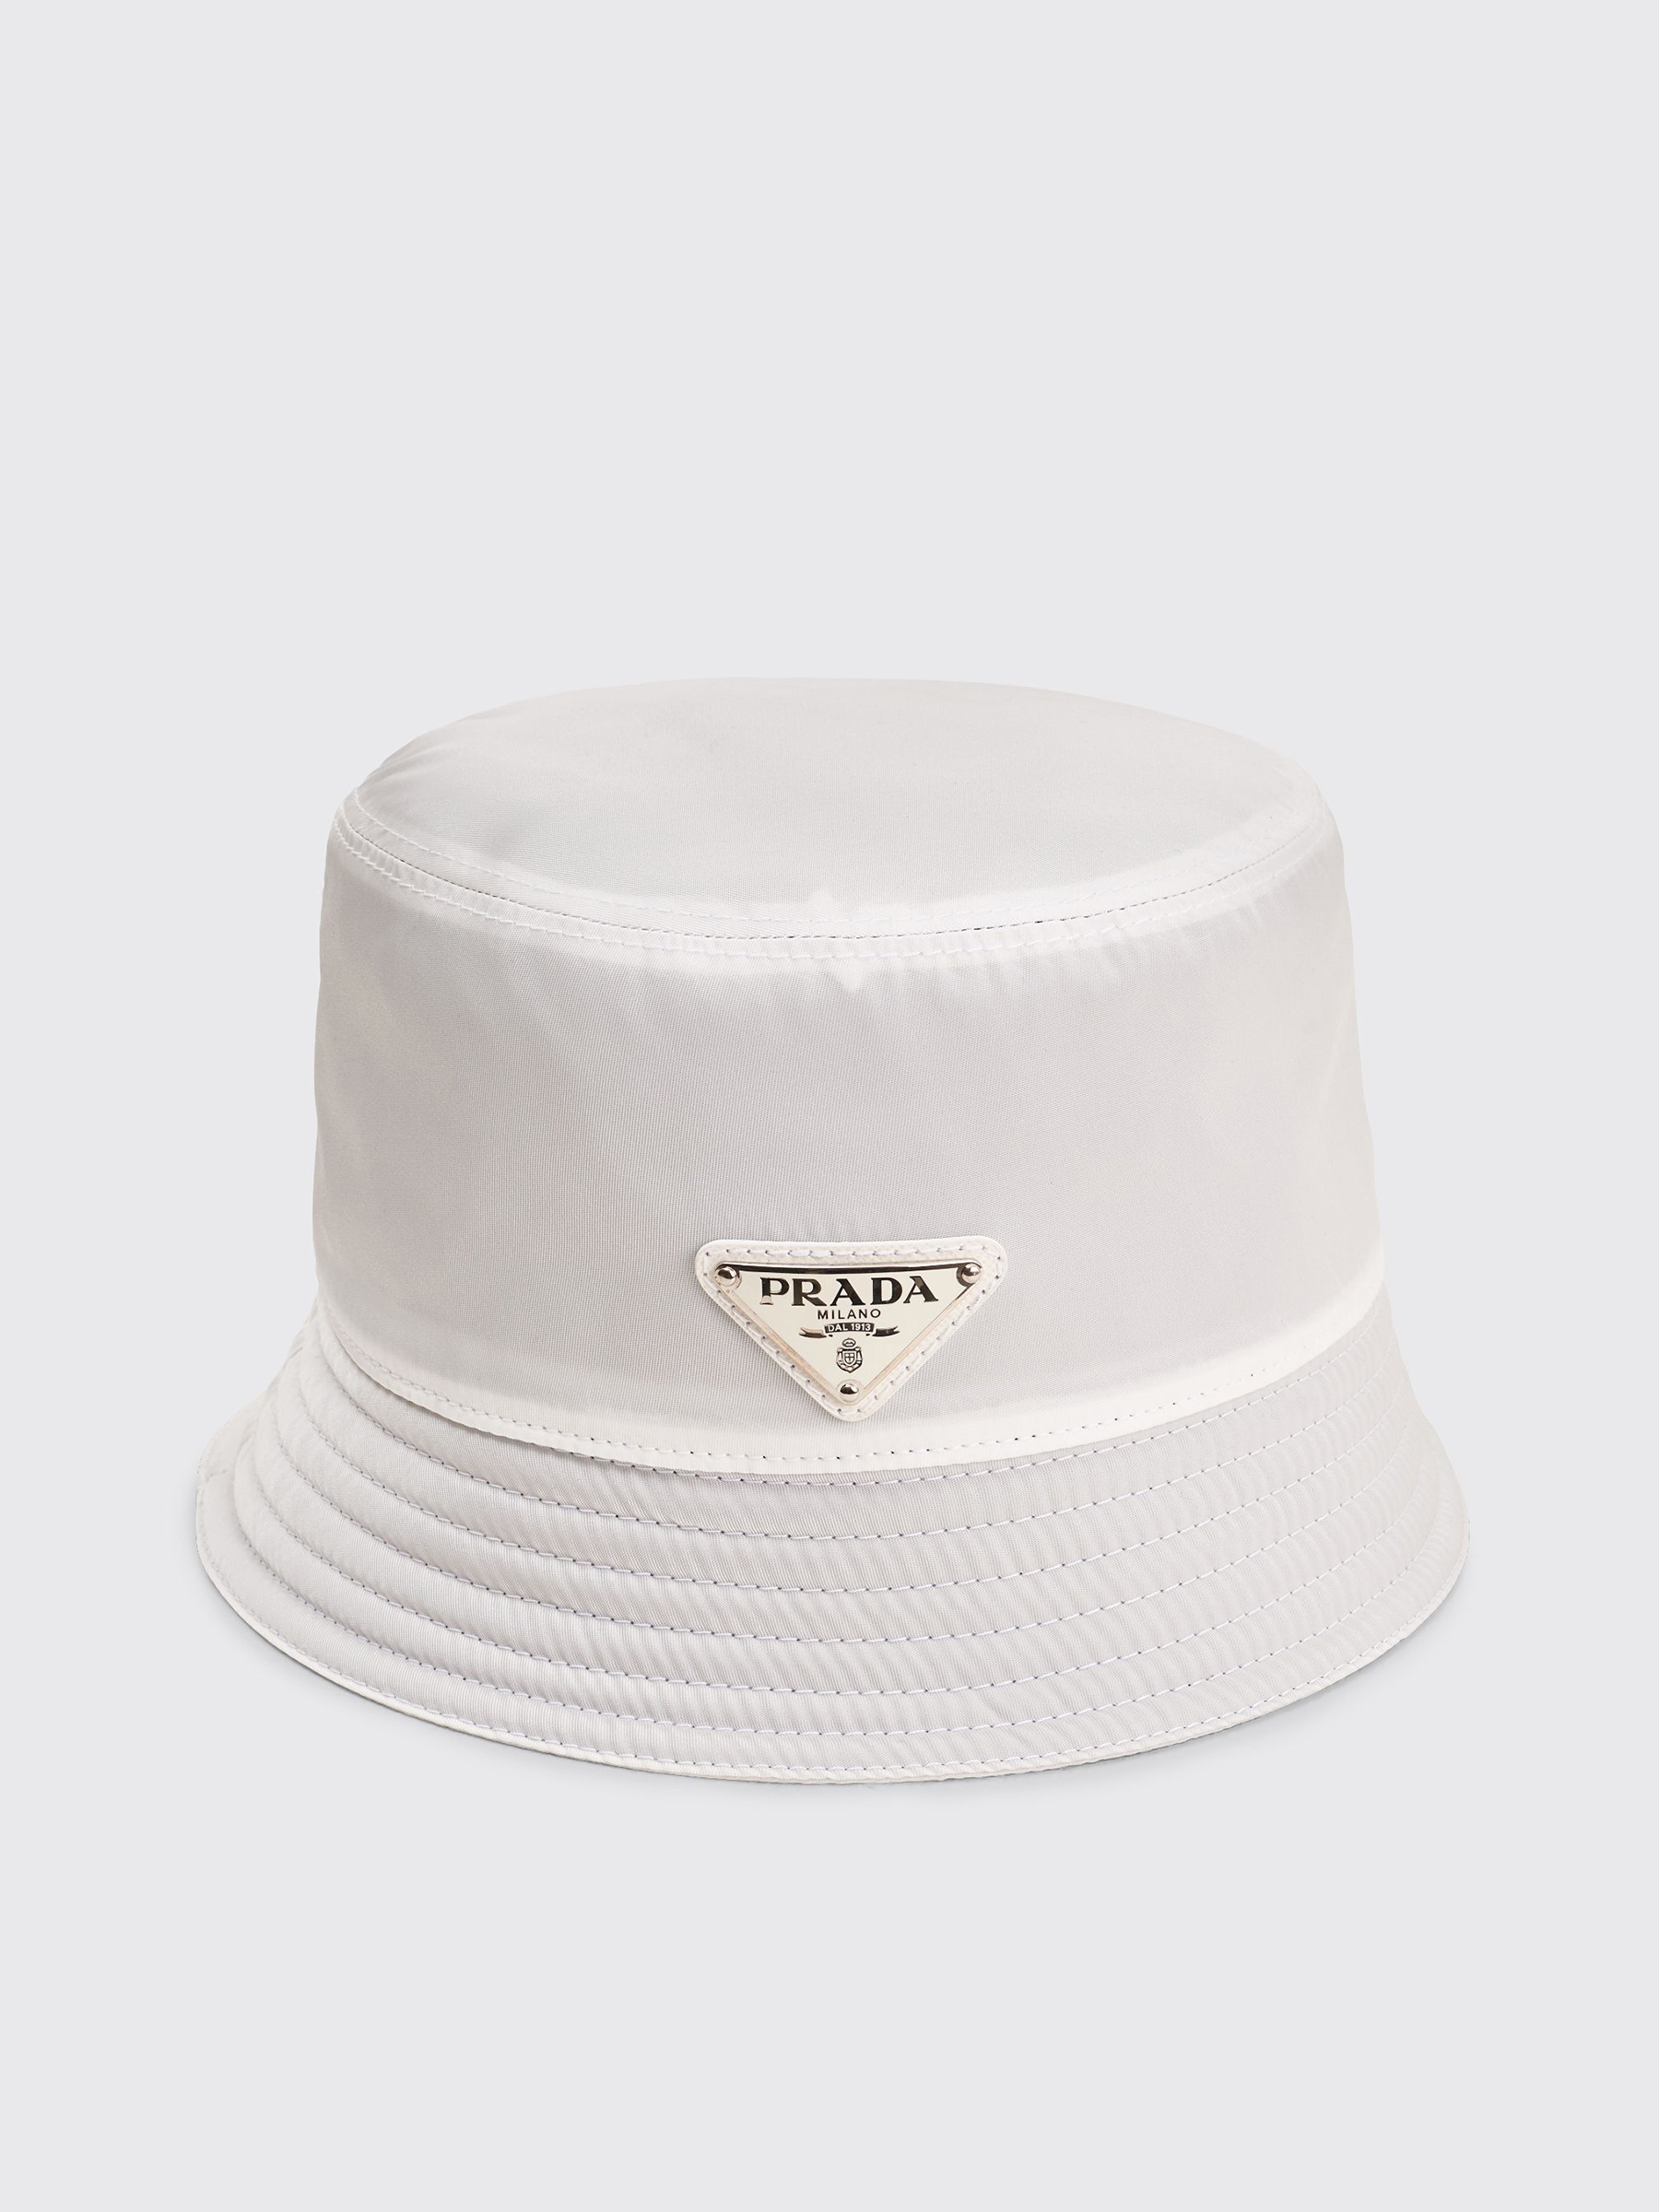 fea5d5864079c Très Bien - Prada Nylon Bucket Hat Triangle Logo White